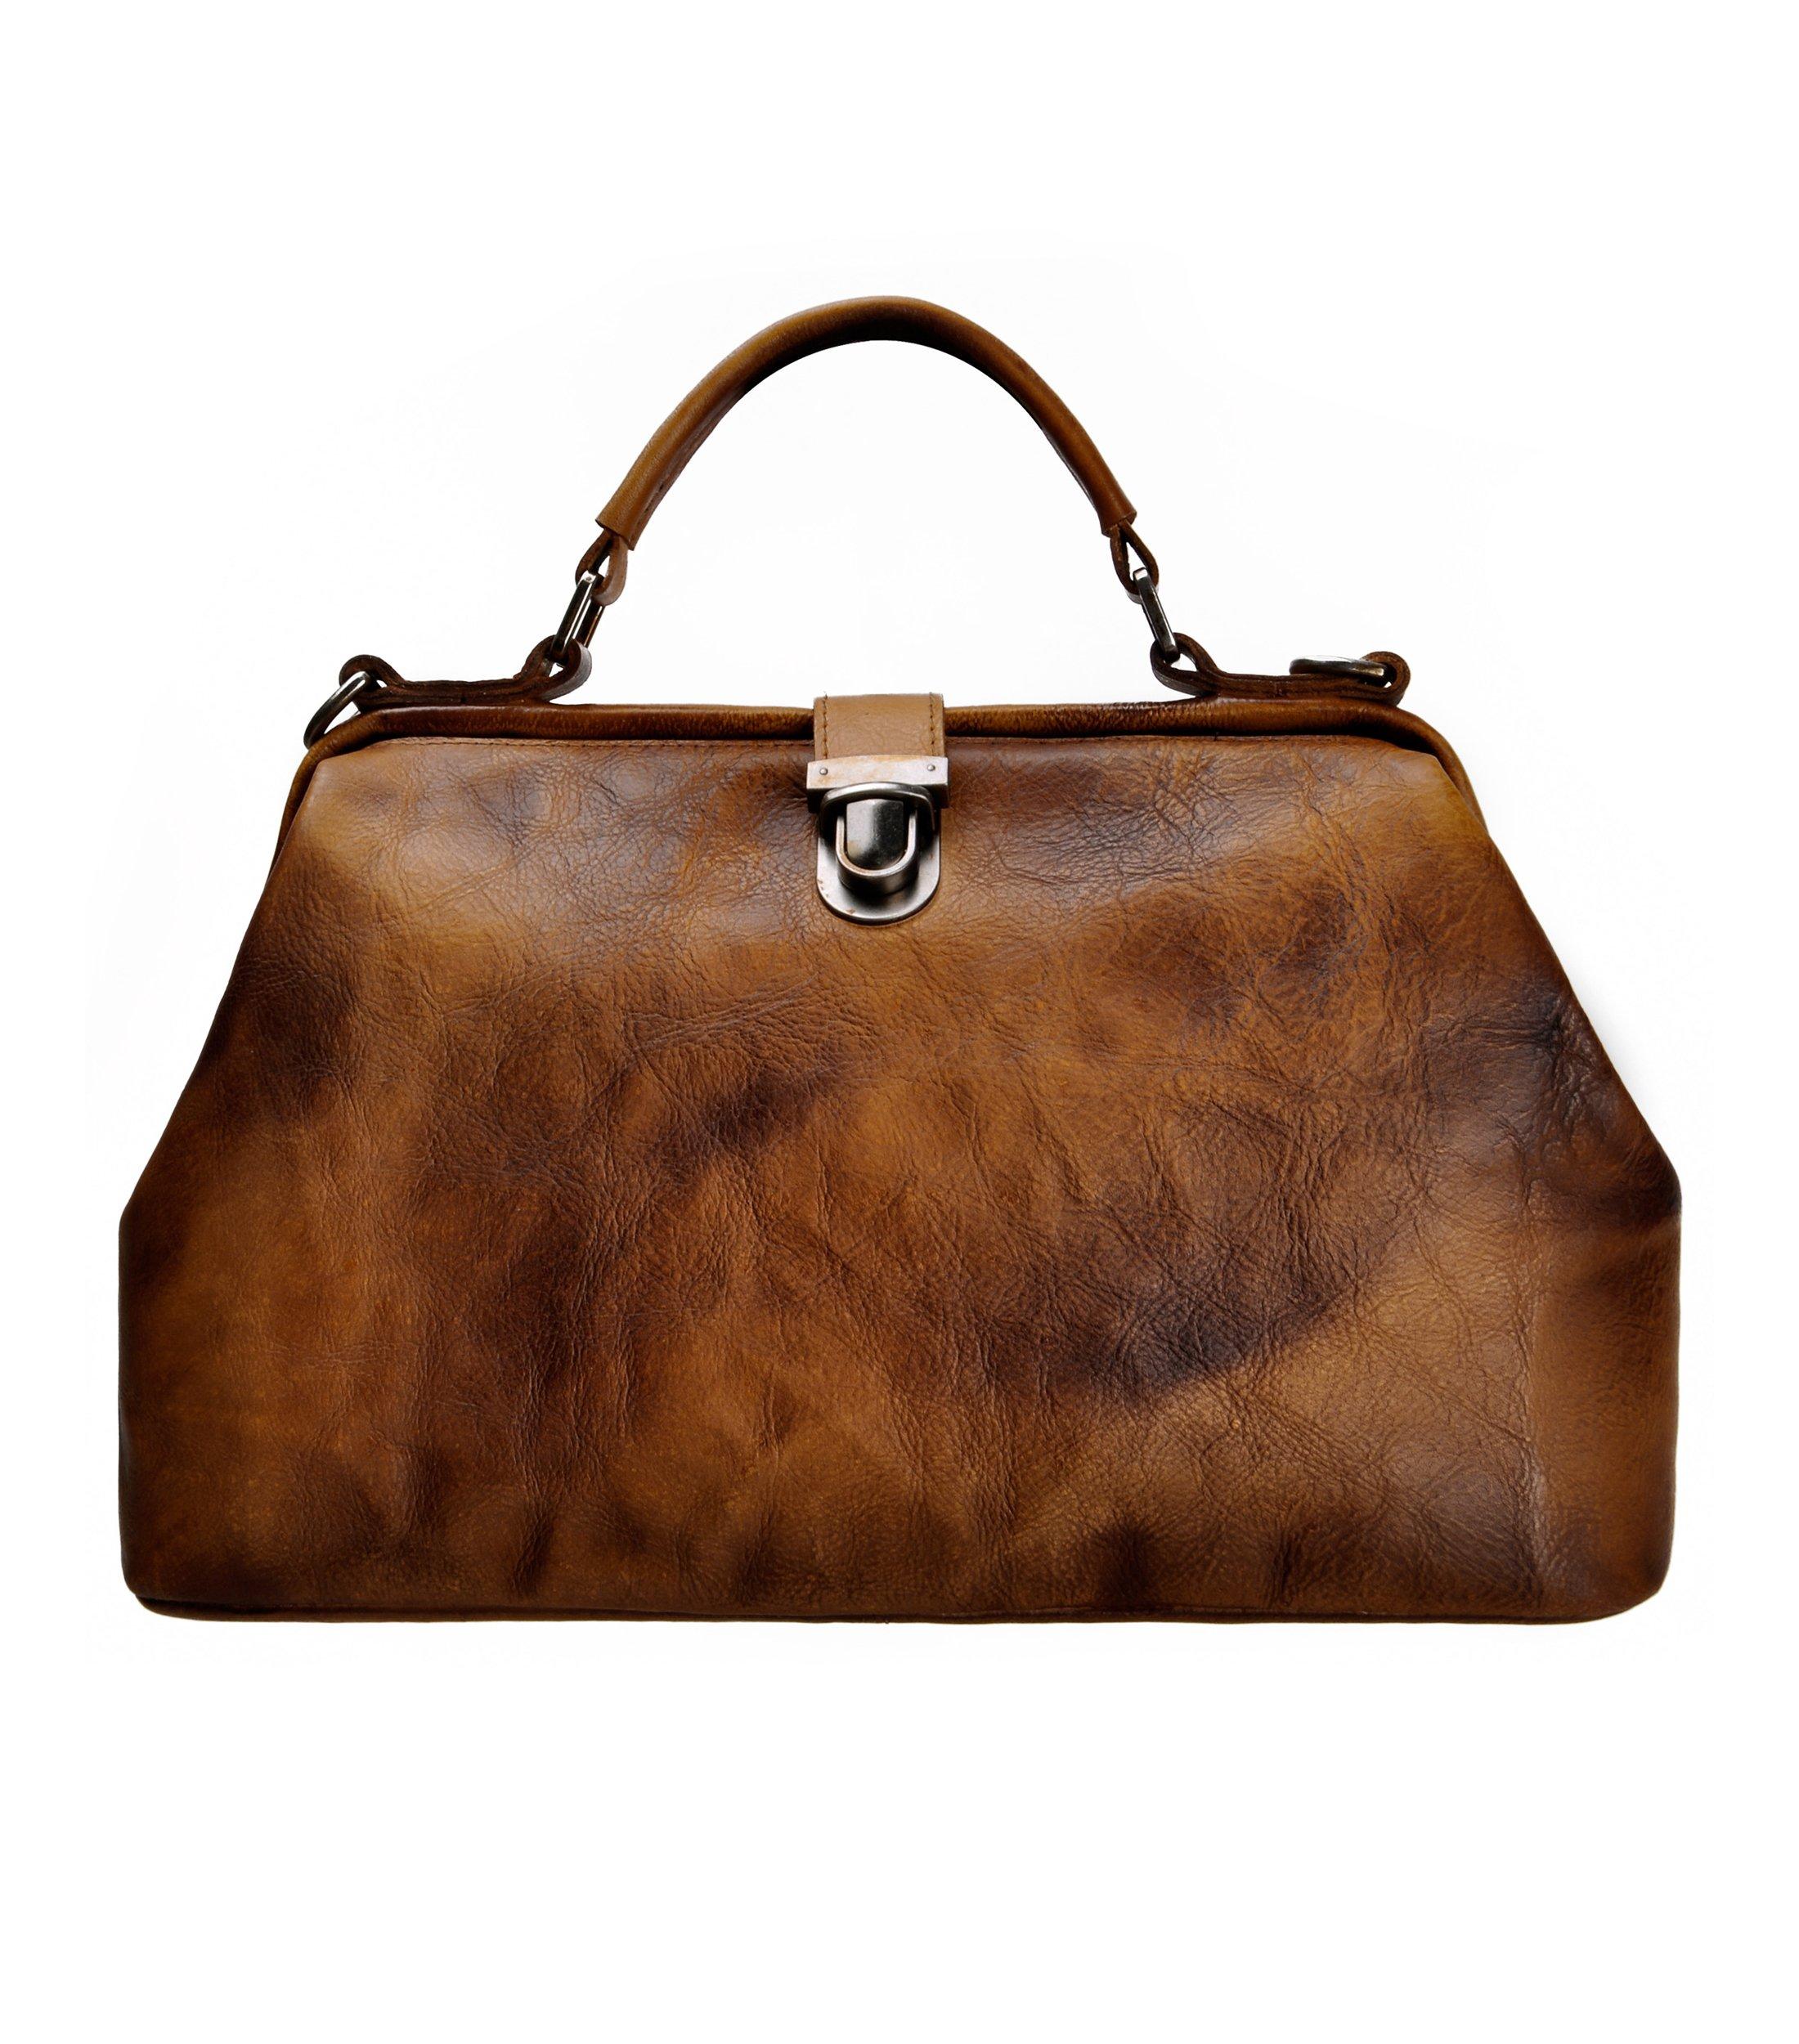 ZLYC Women Retro Vintage Genuine Leather Doctor Top Handle Cross Body Bag, Brown